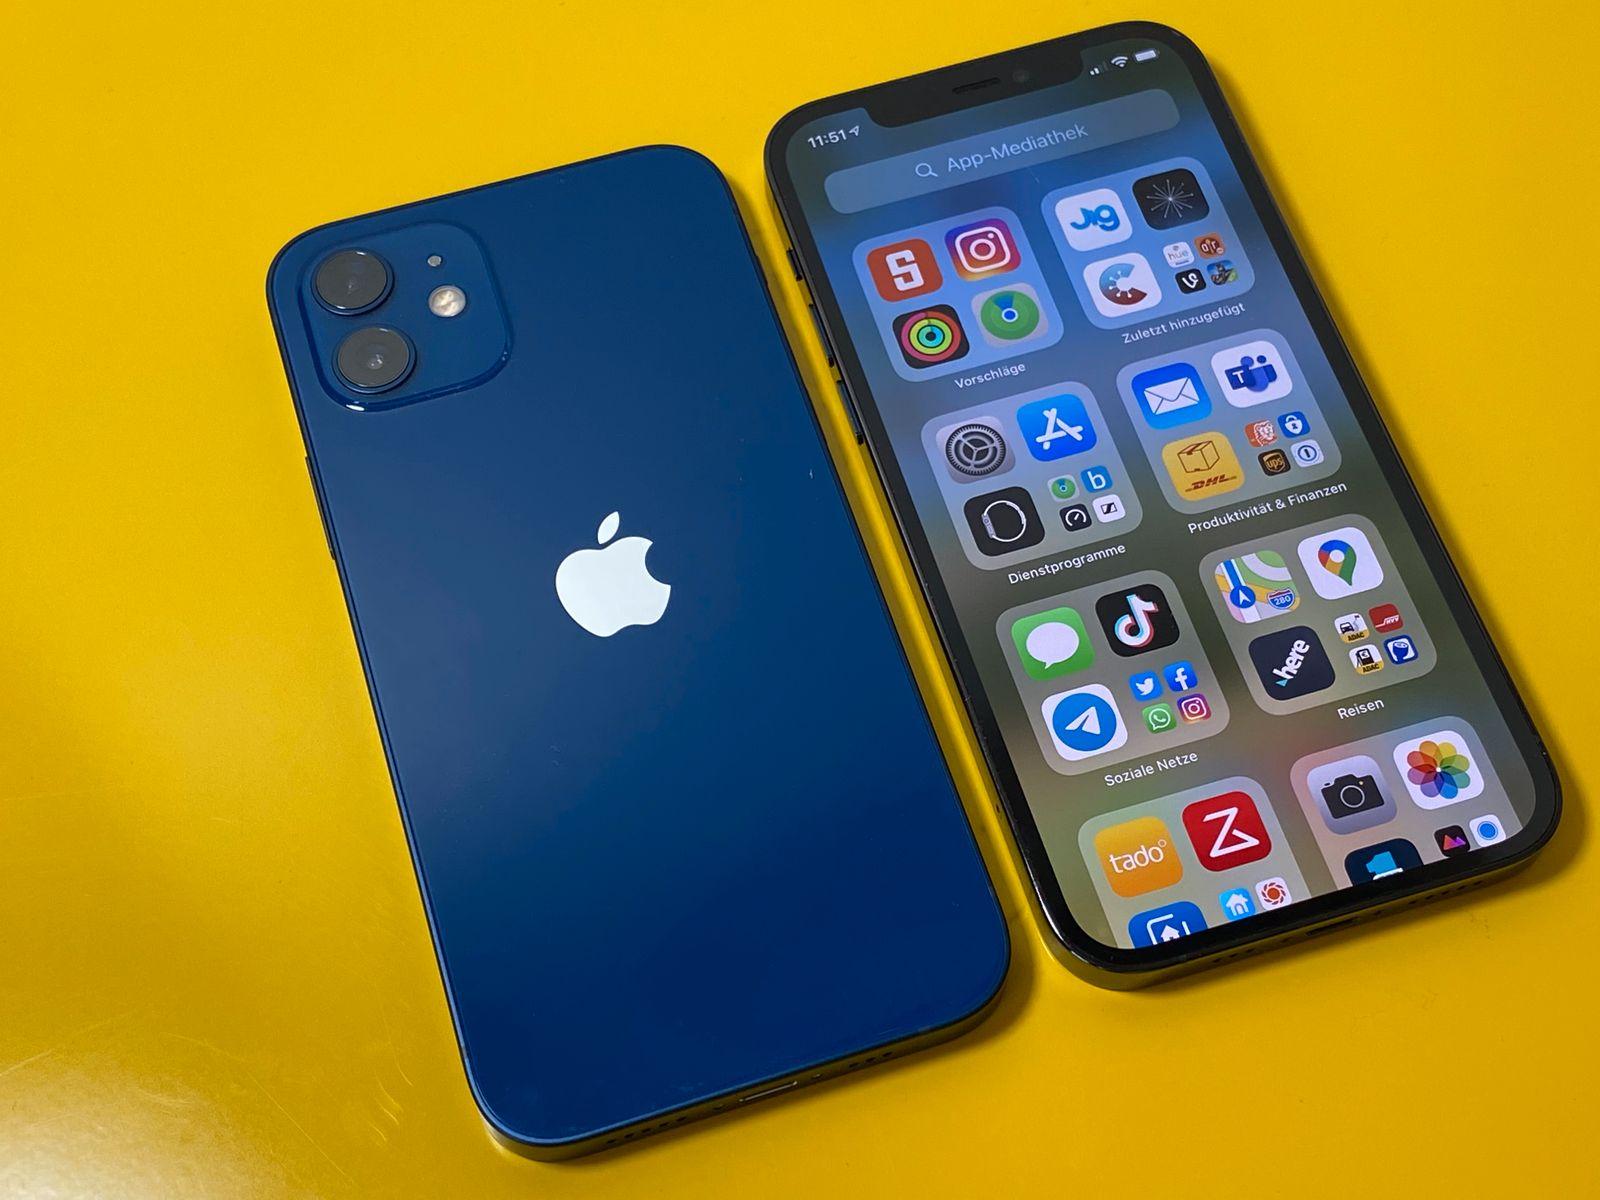 iPhone 12 / SPERRFRIST 20.10. 15 Uhr